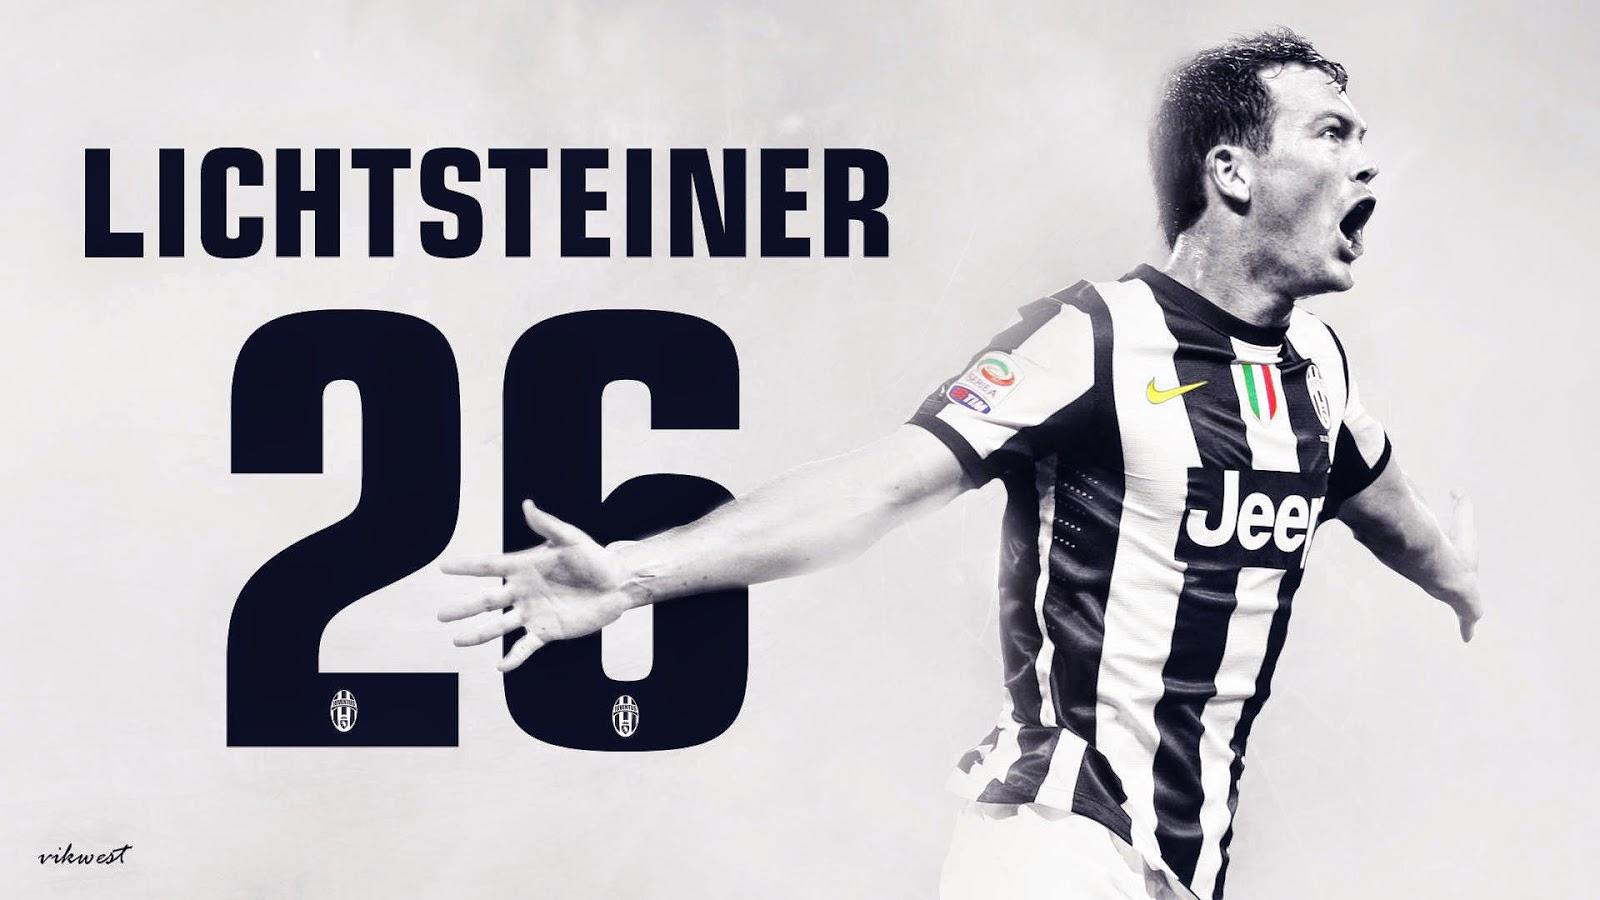 Stephan Lichtsteiner Wallpaper: Hamos_A7x_Juventus: Juventus Wallpaper